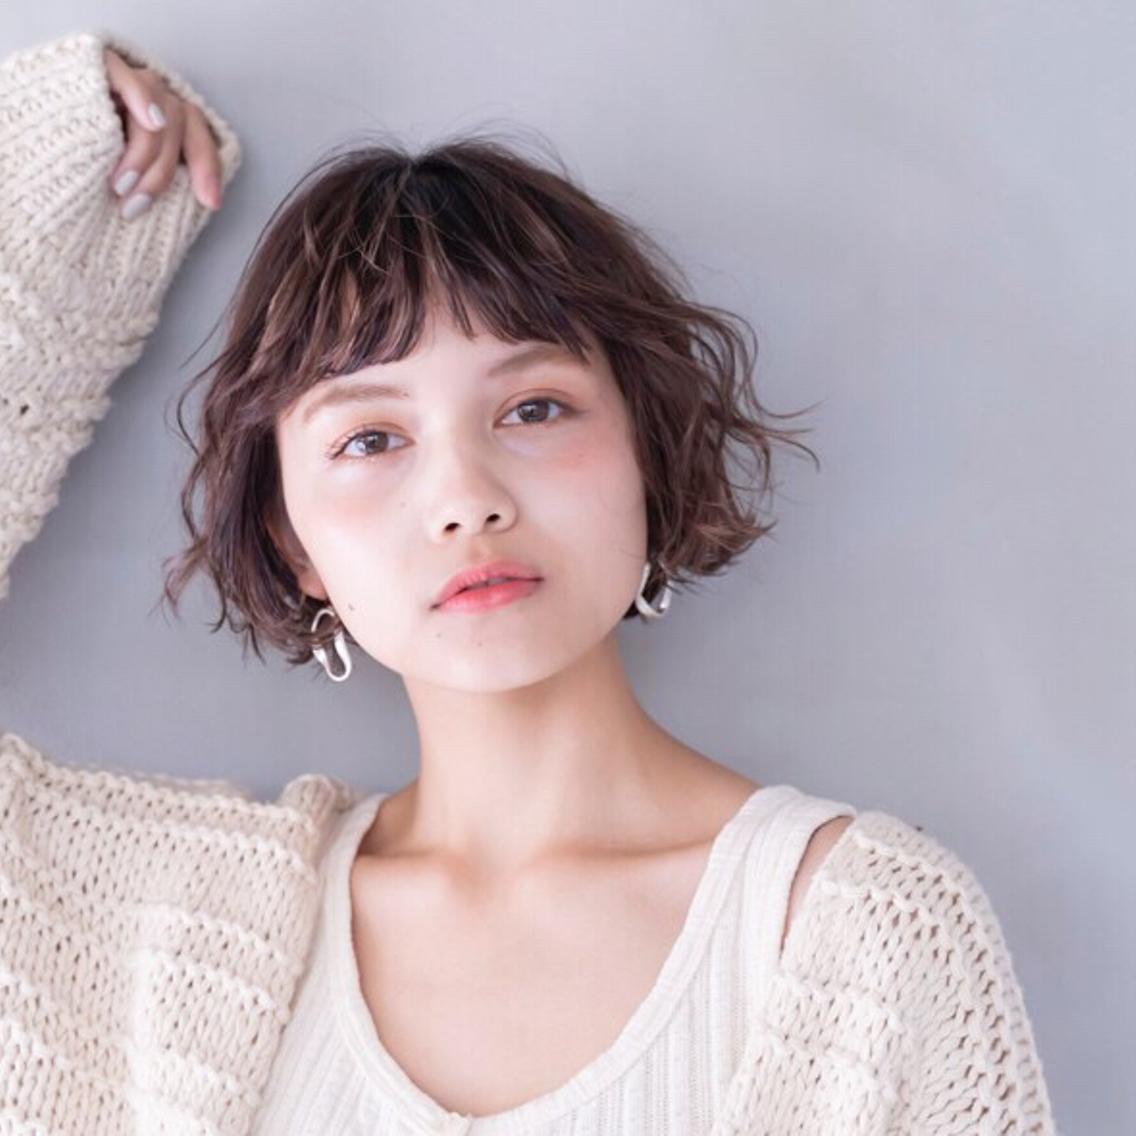 Aimee所属・トップスタイリストAimee小山雄の掲載